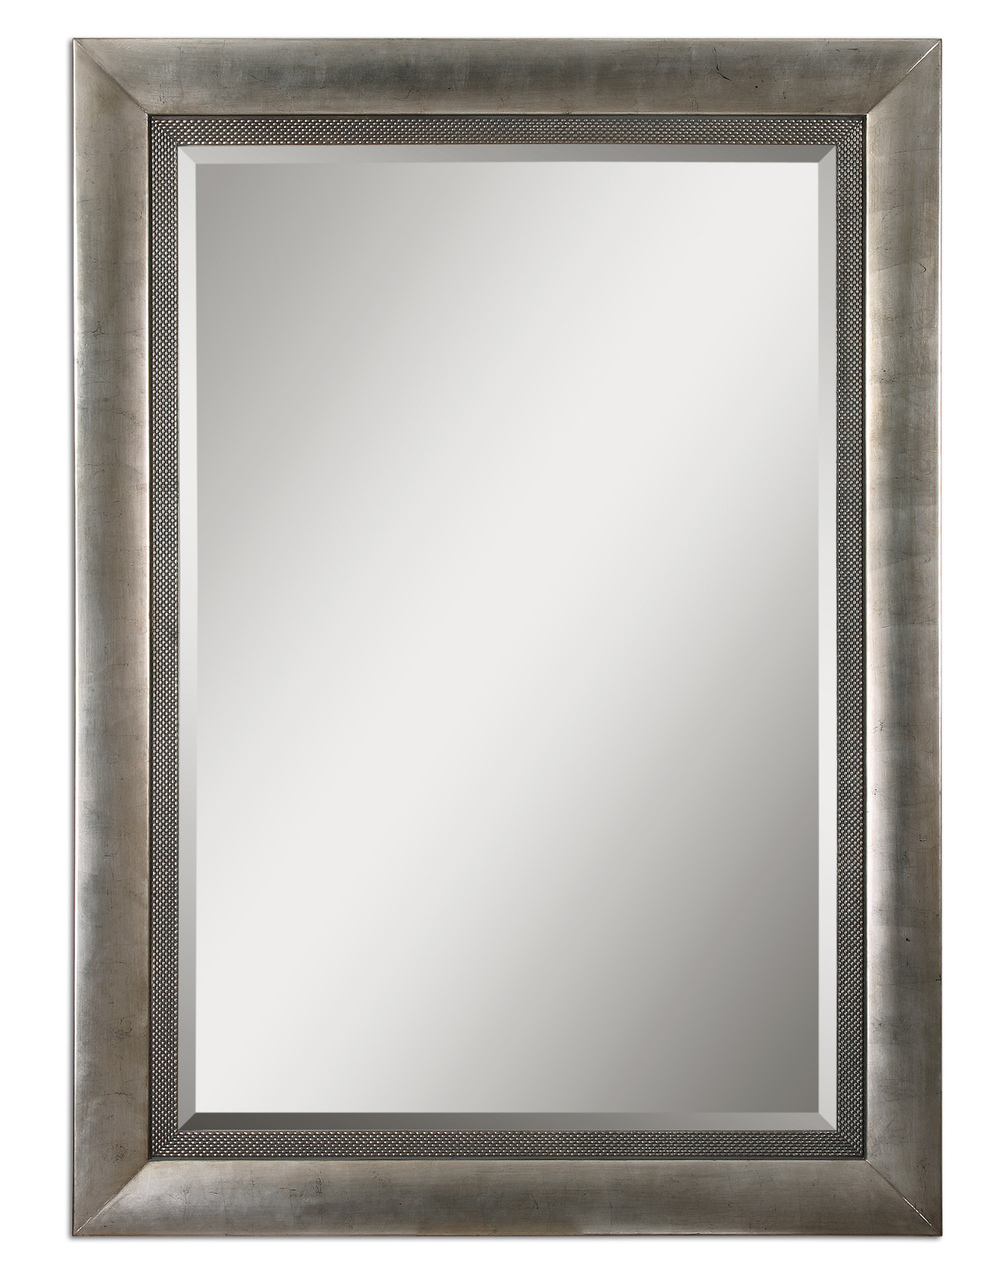 Uttermost Company - Gilford Antique Silver Mirror